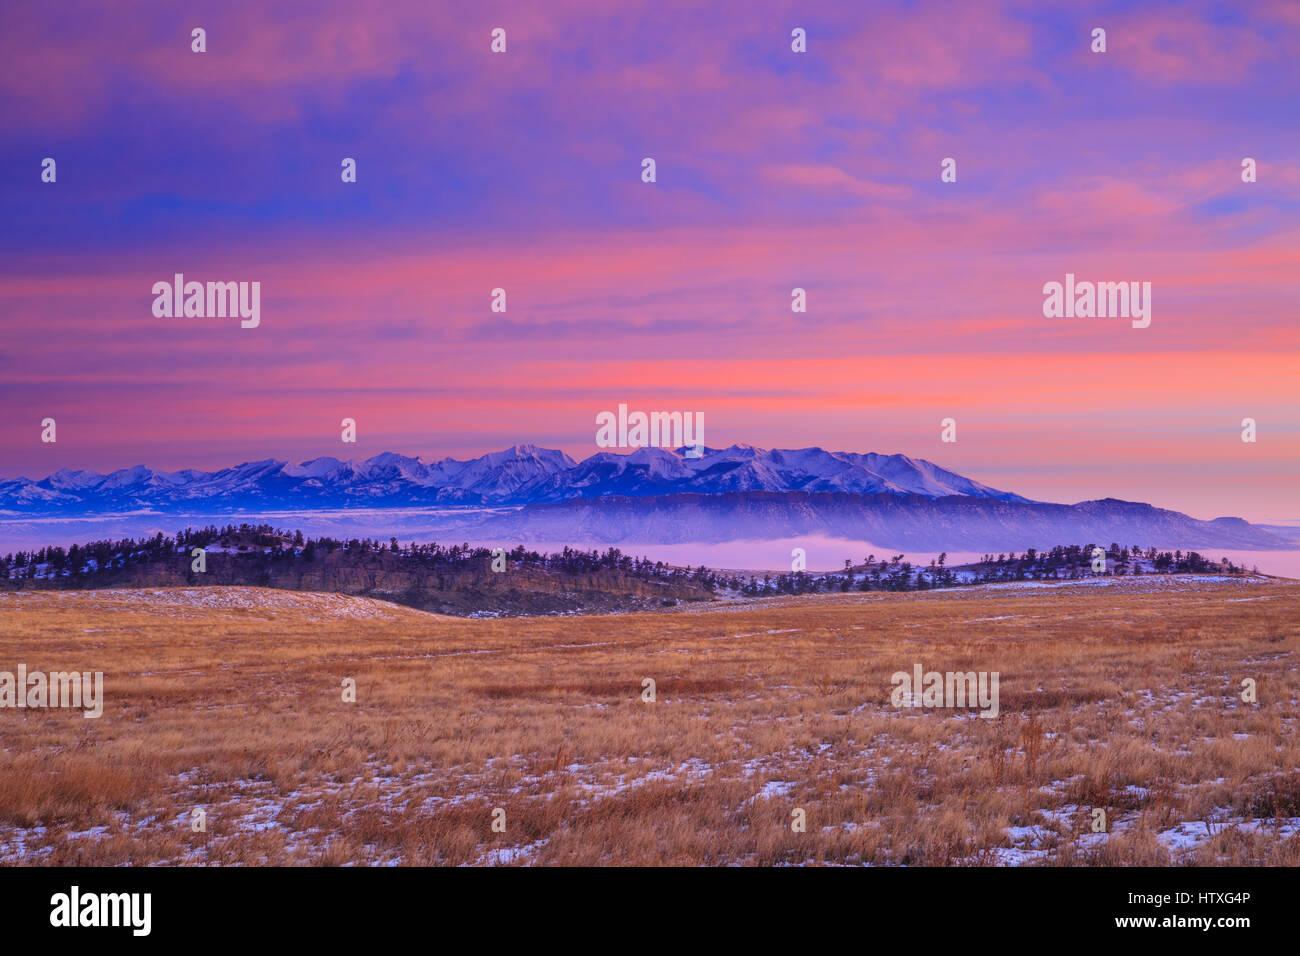 morning sky over the crazy mountains and sheep mountain near livingston, montana - Stock Image